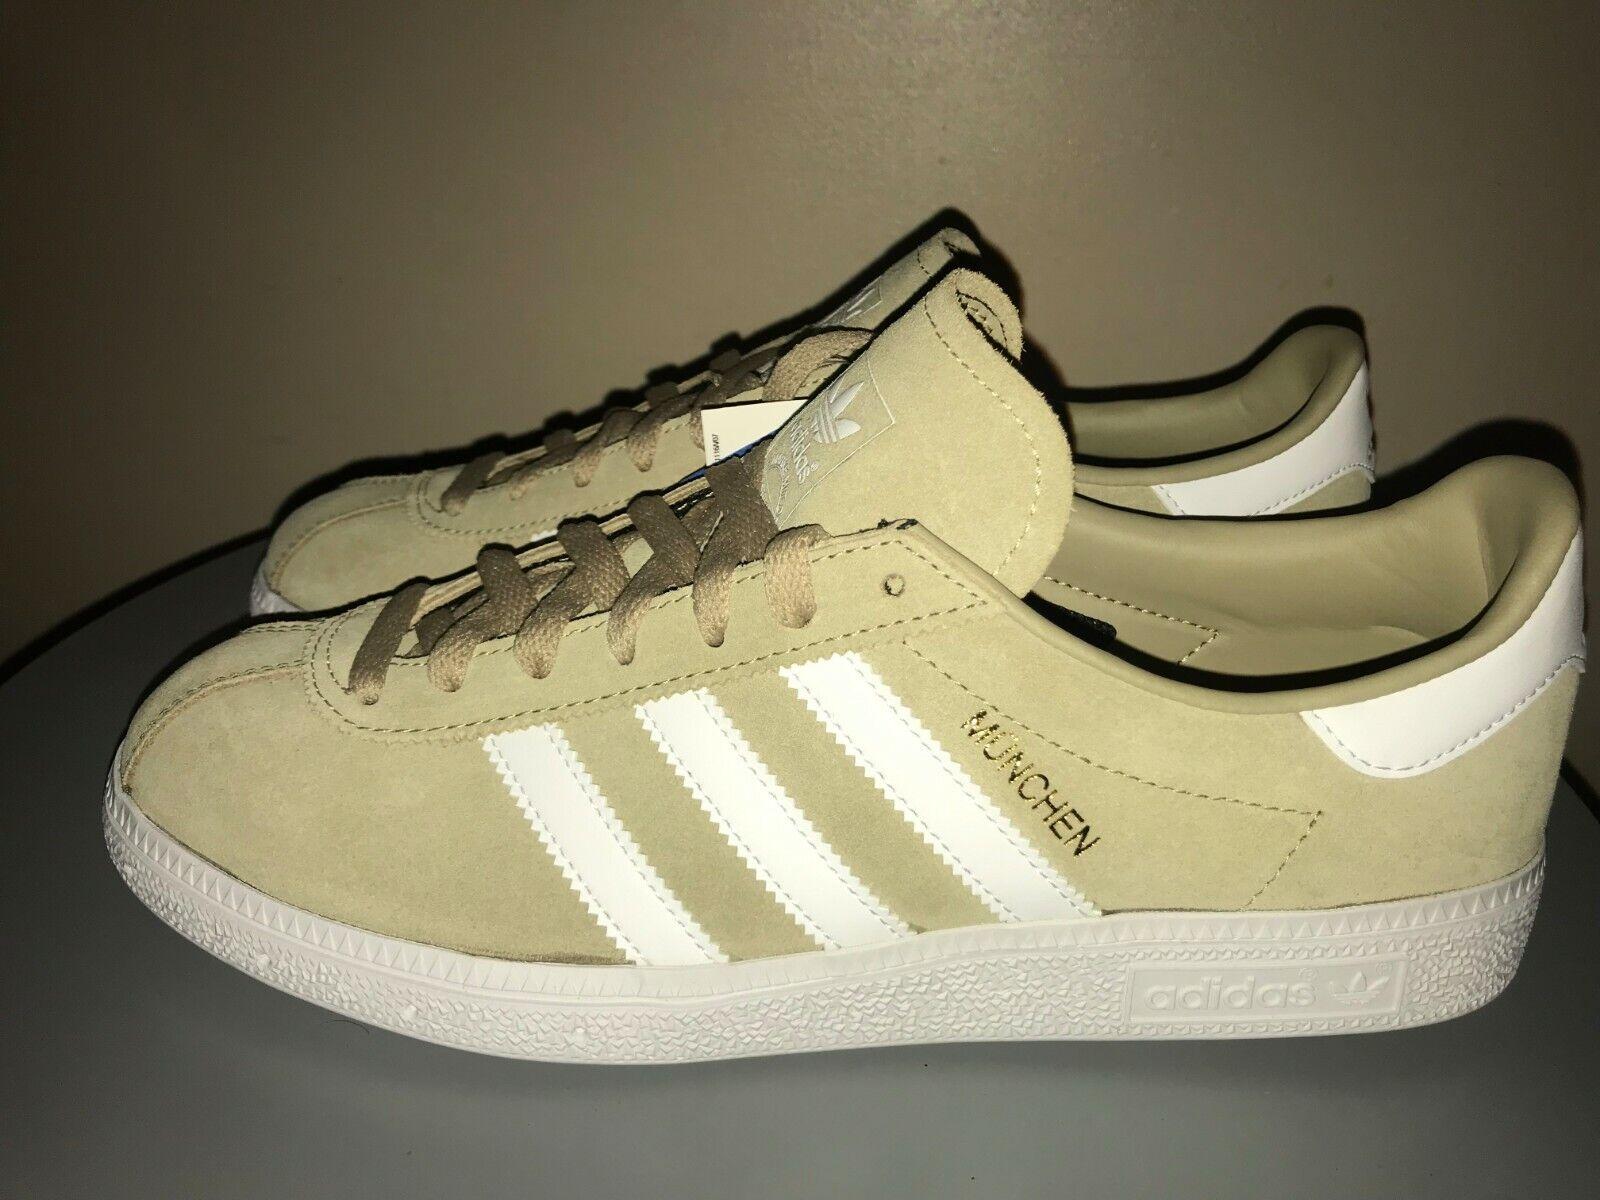 e5ceafc6ff137 Adidas Men s retro MUNCHEN Trainers Sneakers New Khaki USA 8.5 ...